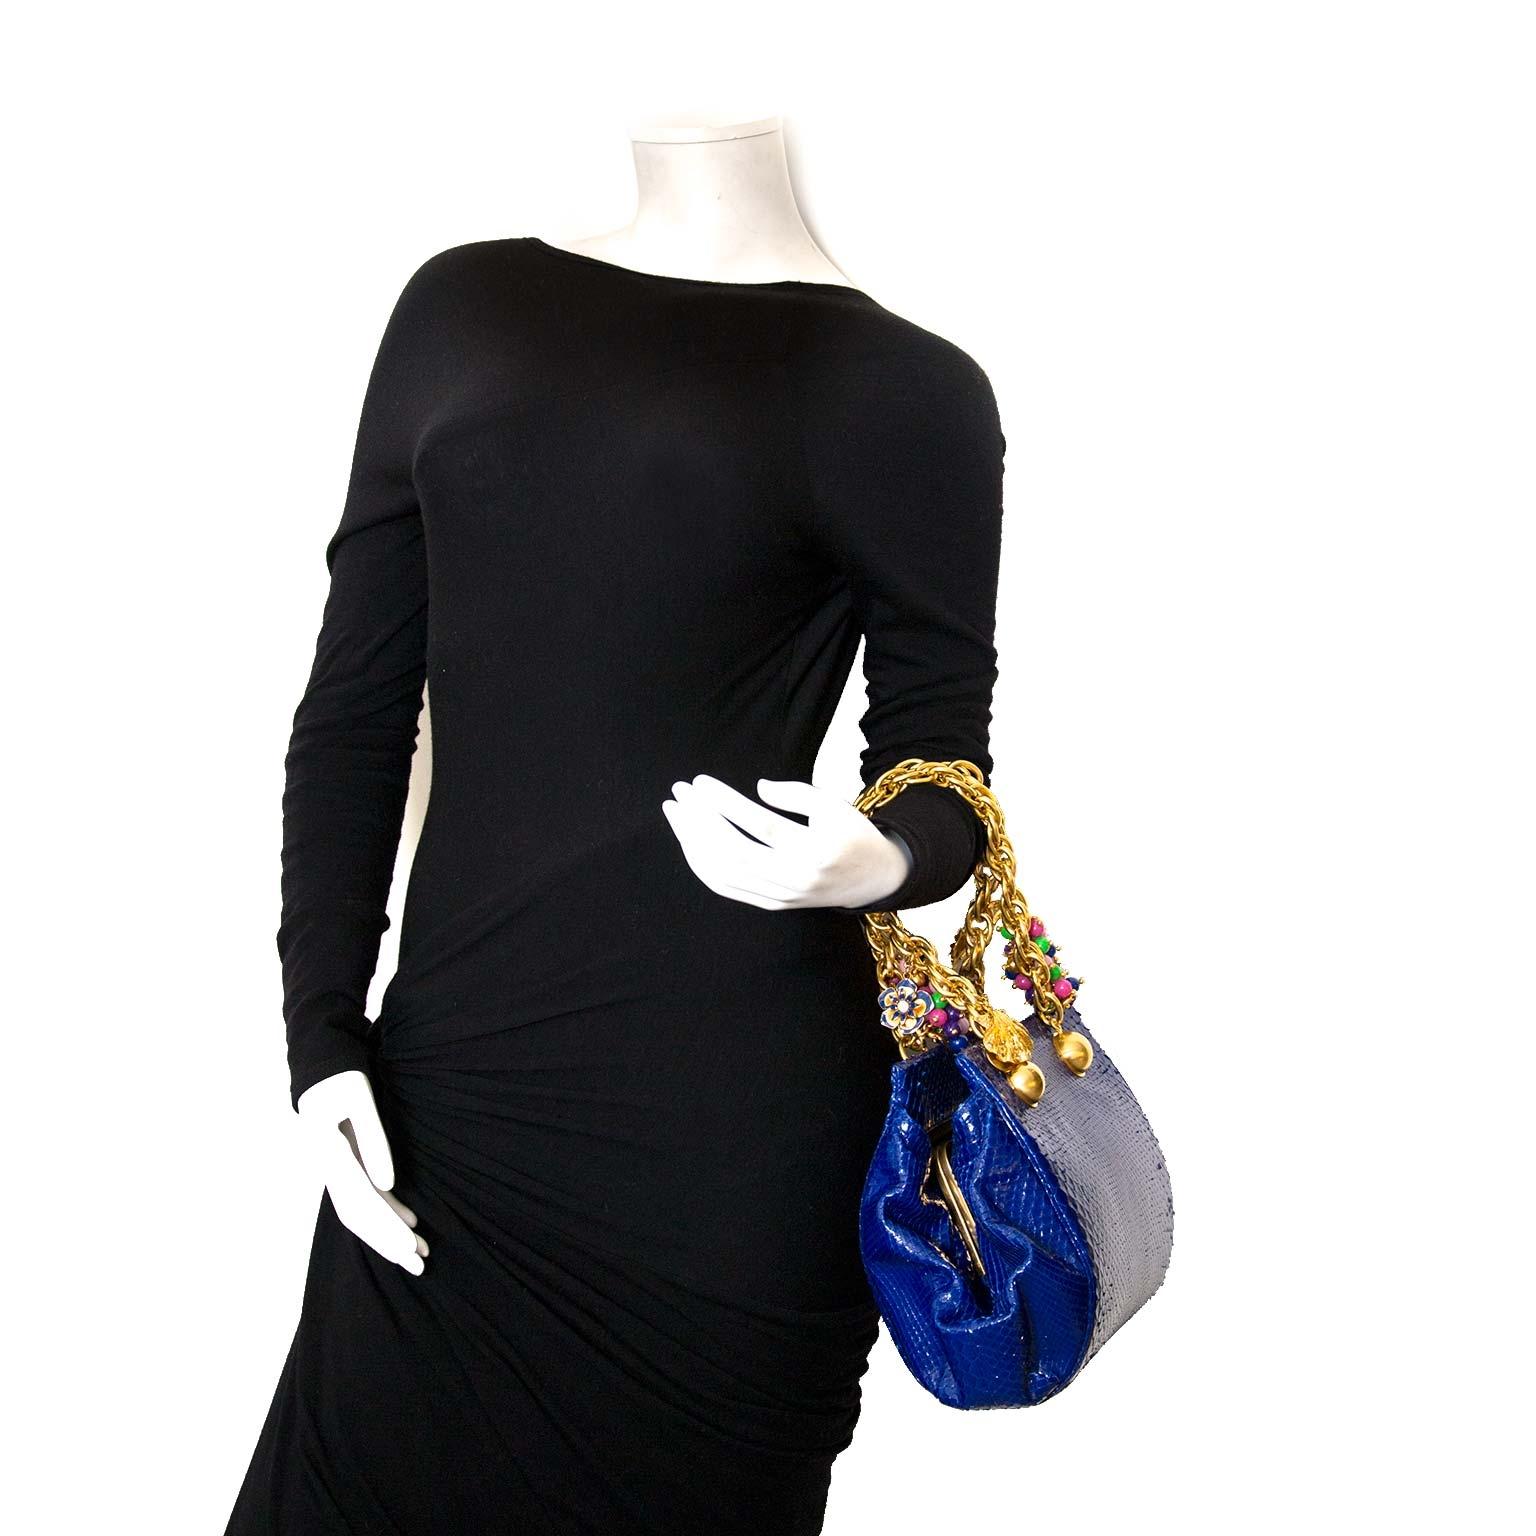 koop authenieke versace python tassen nu online bij labellov vintage webshop